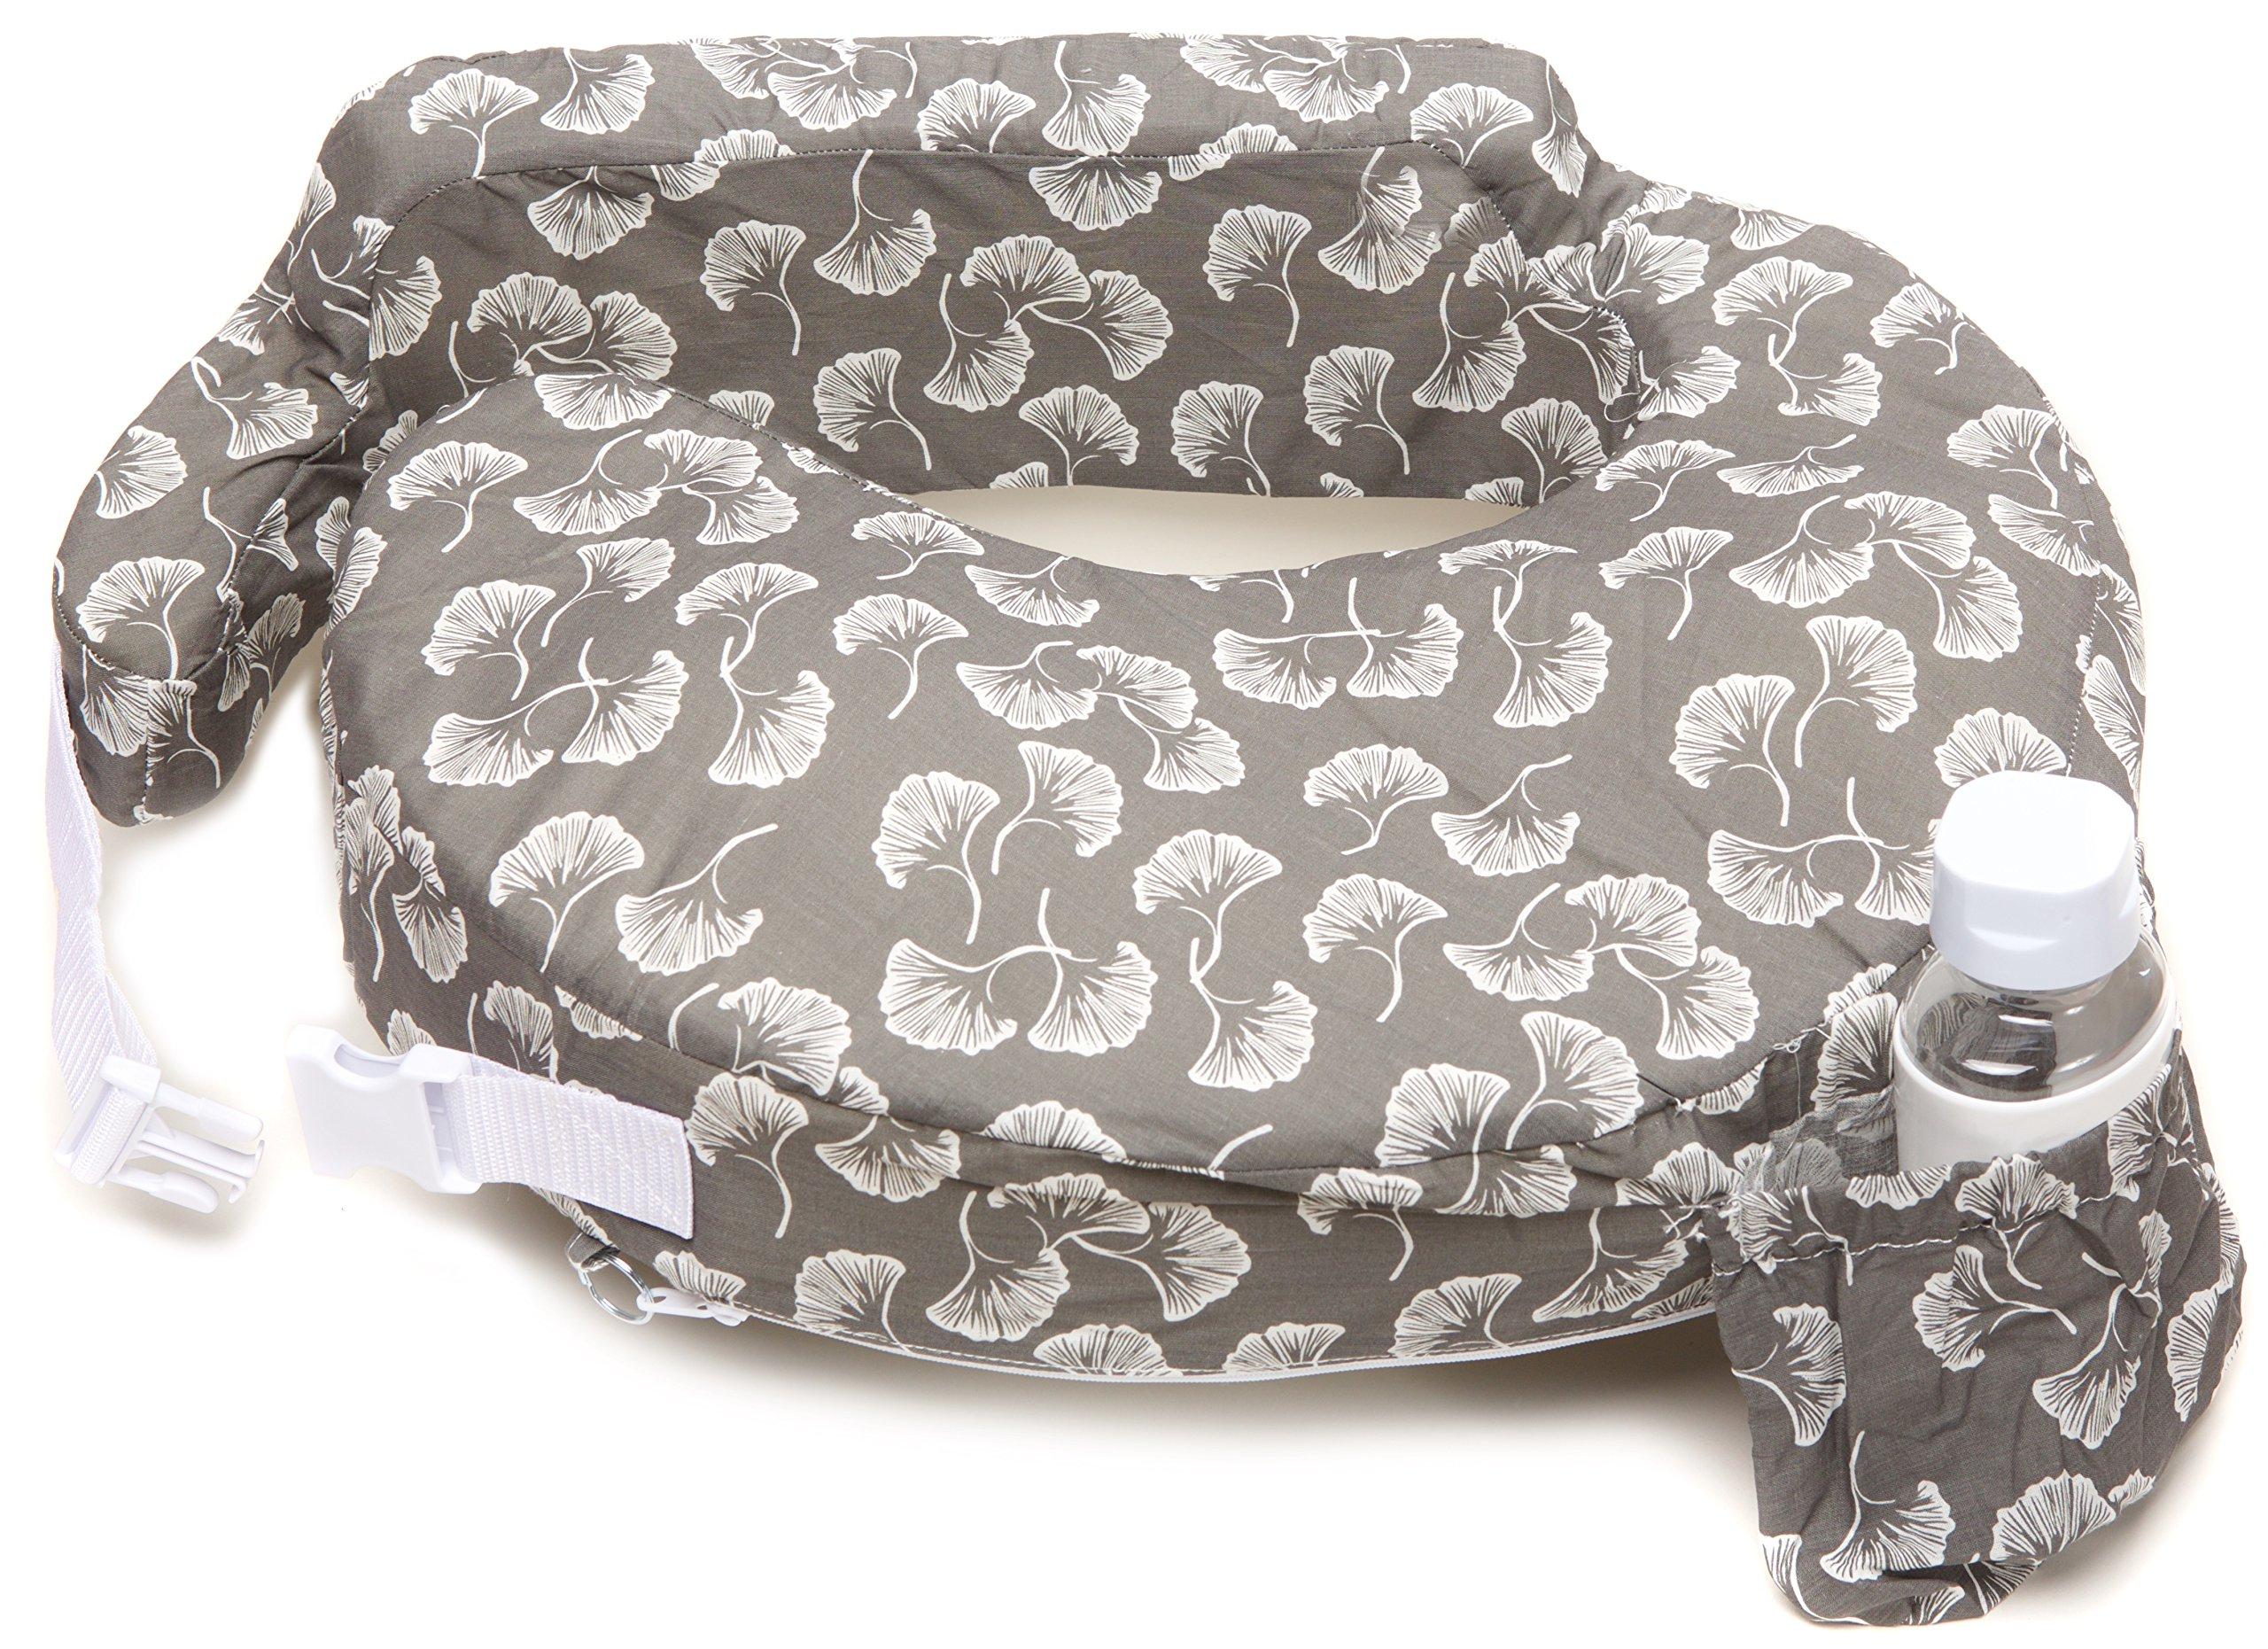 My Brest Friend Original Nursing Posture Pillow, Grey Flowing Fans